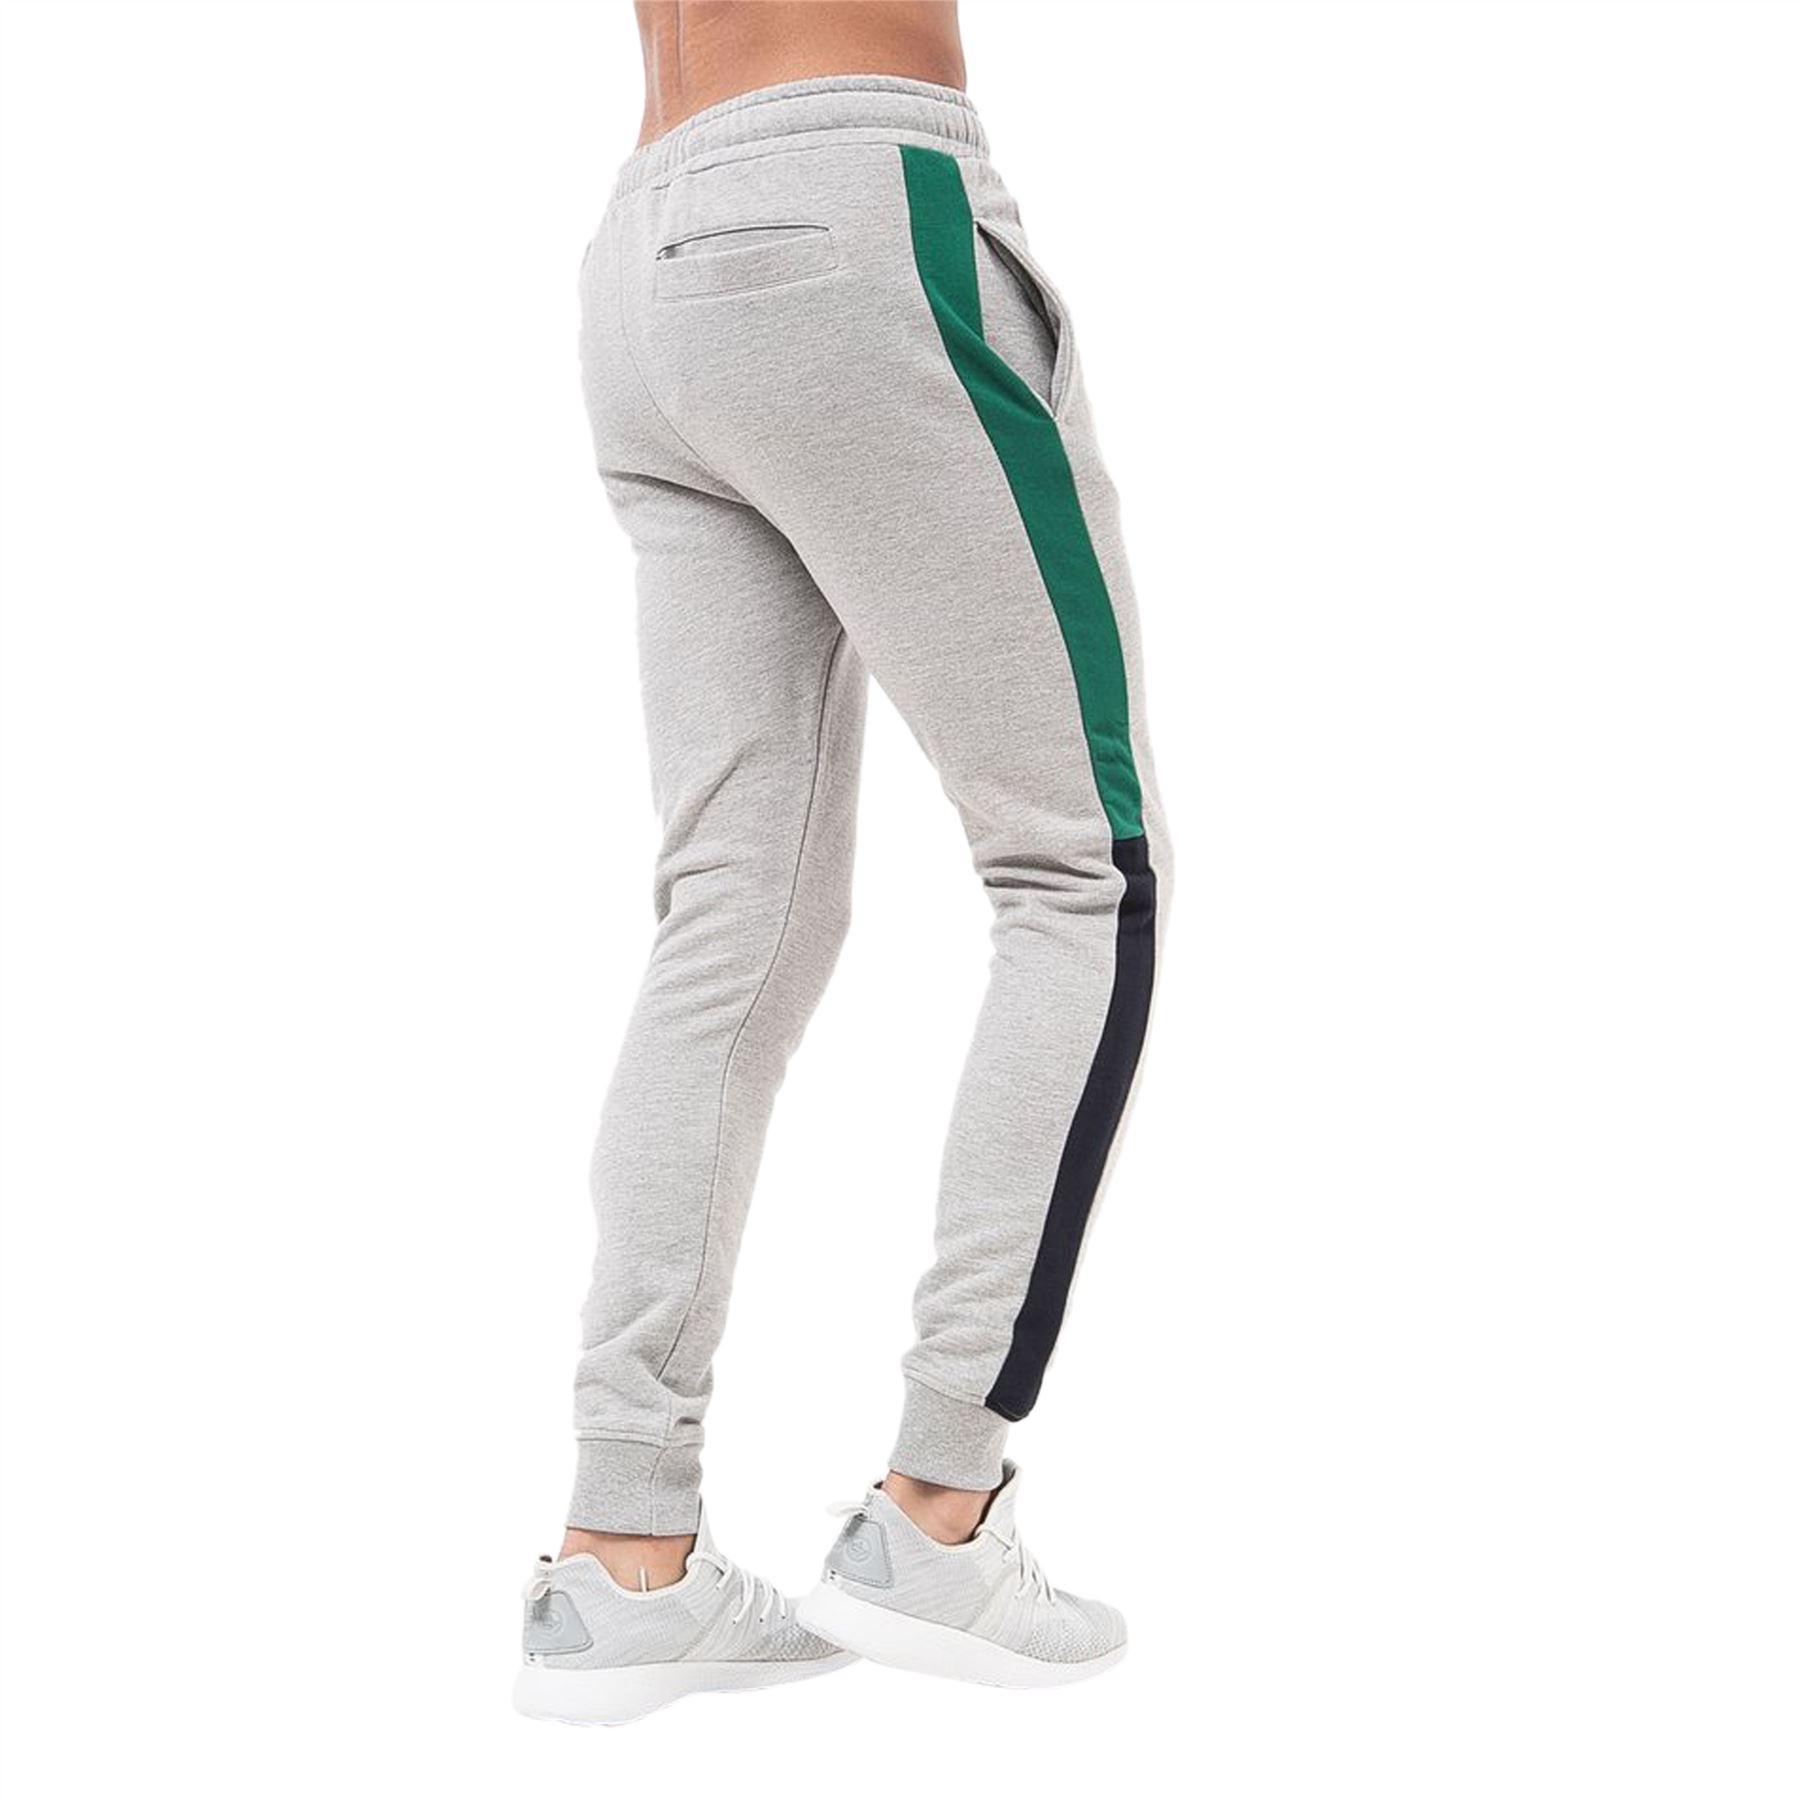 Mens-Joggers-Pants-Crosshatch-Daglum-Tracksuit-Jogging-Trousers thumbnail 3